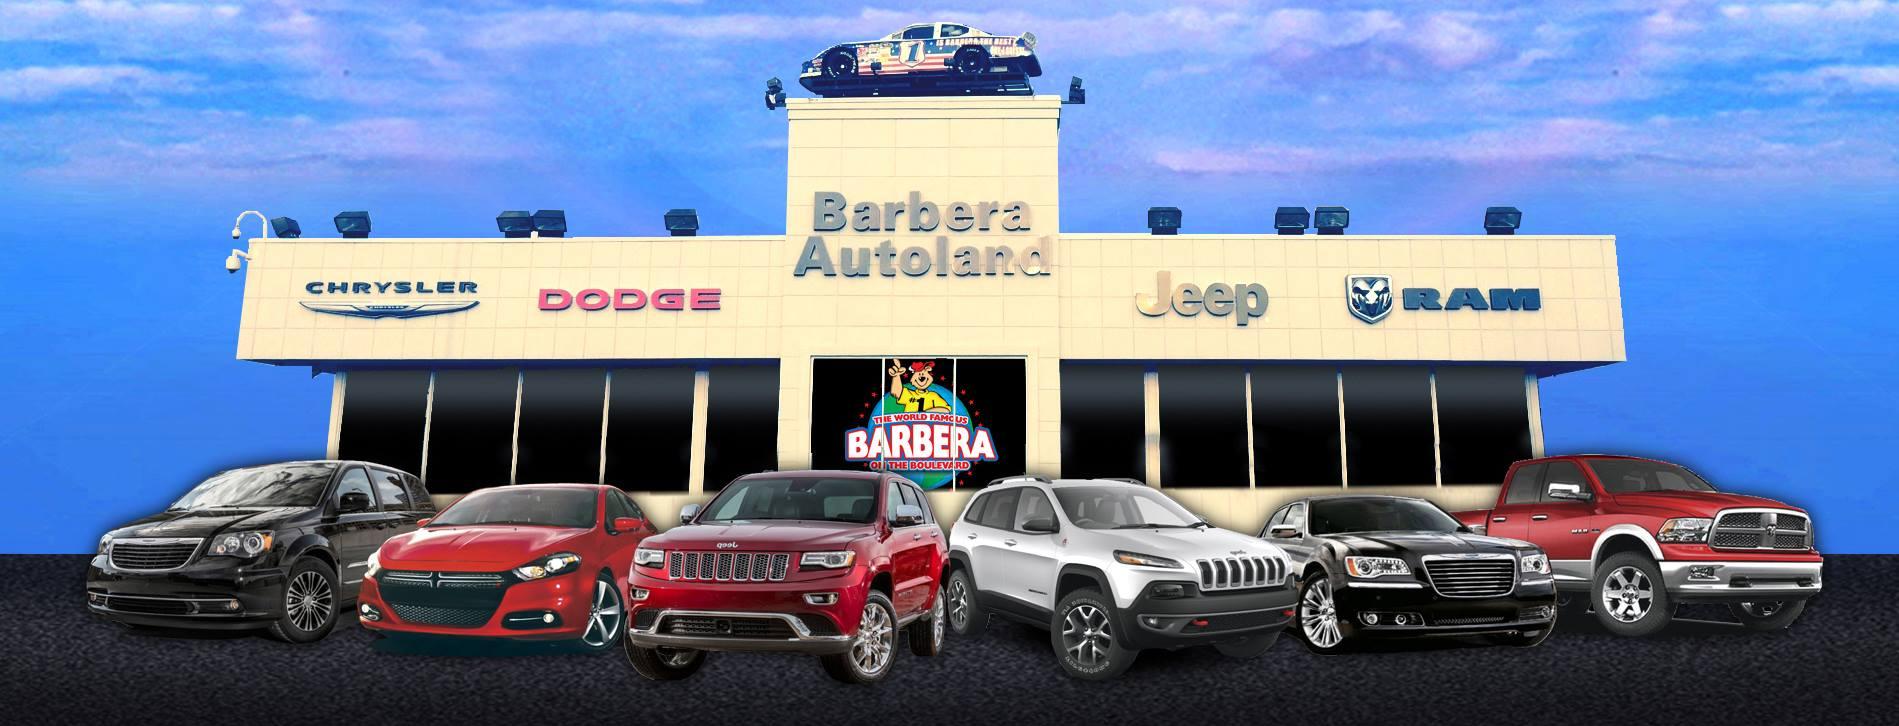 Barbera autoland philadelphia chrysler dodge jeep ram dealership barbera autoland philadelphia chrysler dodge jeep ram dealership sales service auto finance near langhorne pa fandeluxe Choice Image